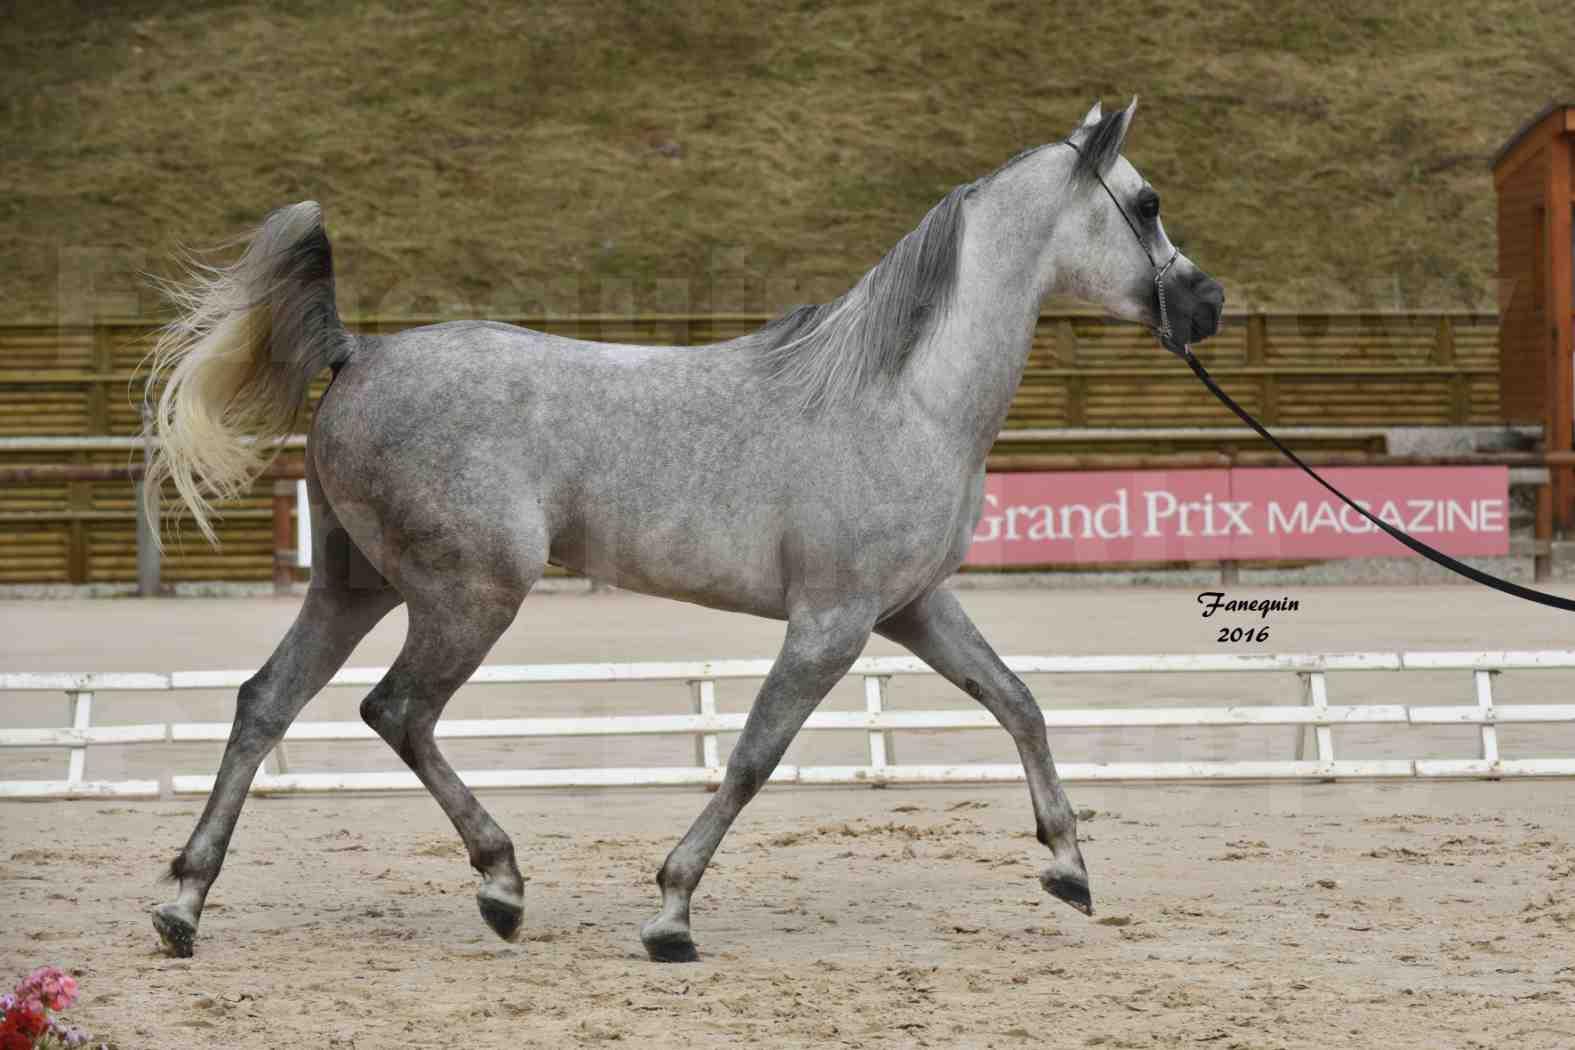 Show national de chevaux arabe à CHAZEY sur AIN - ANWAR ISHANE - 13